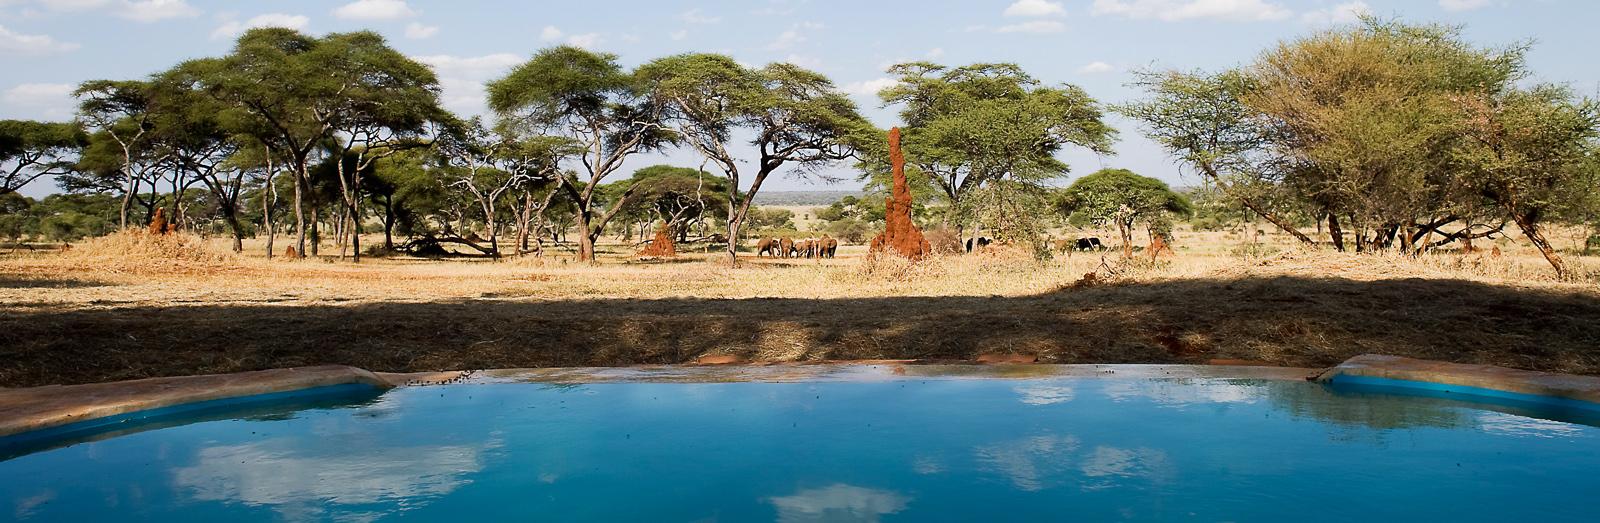 Sanctuary Swala pool - сафари не выходя из бассейна